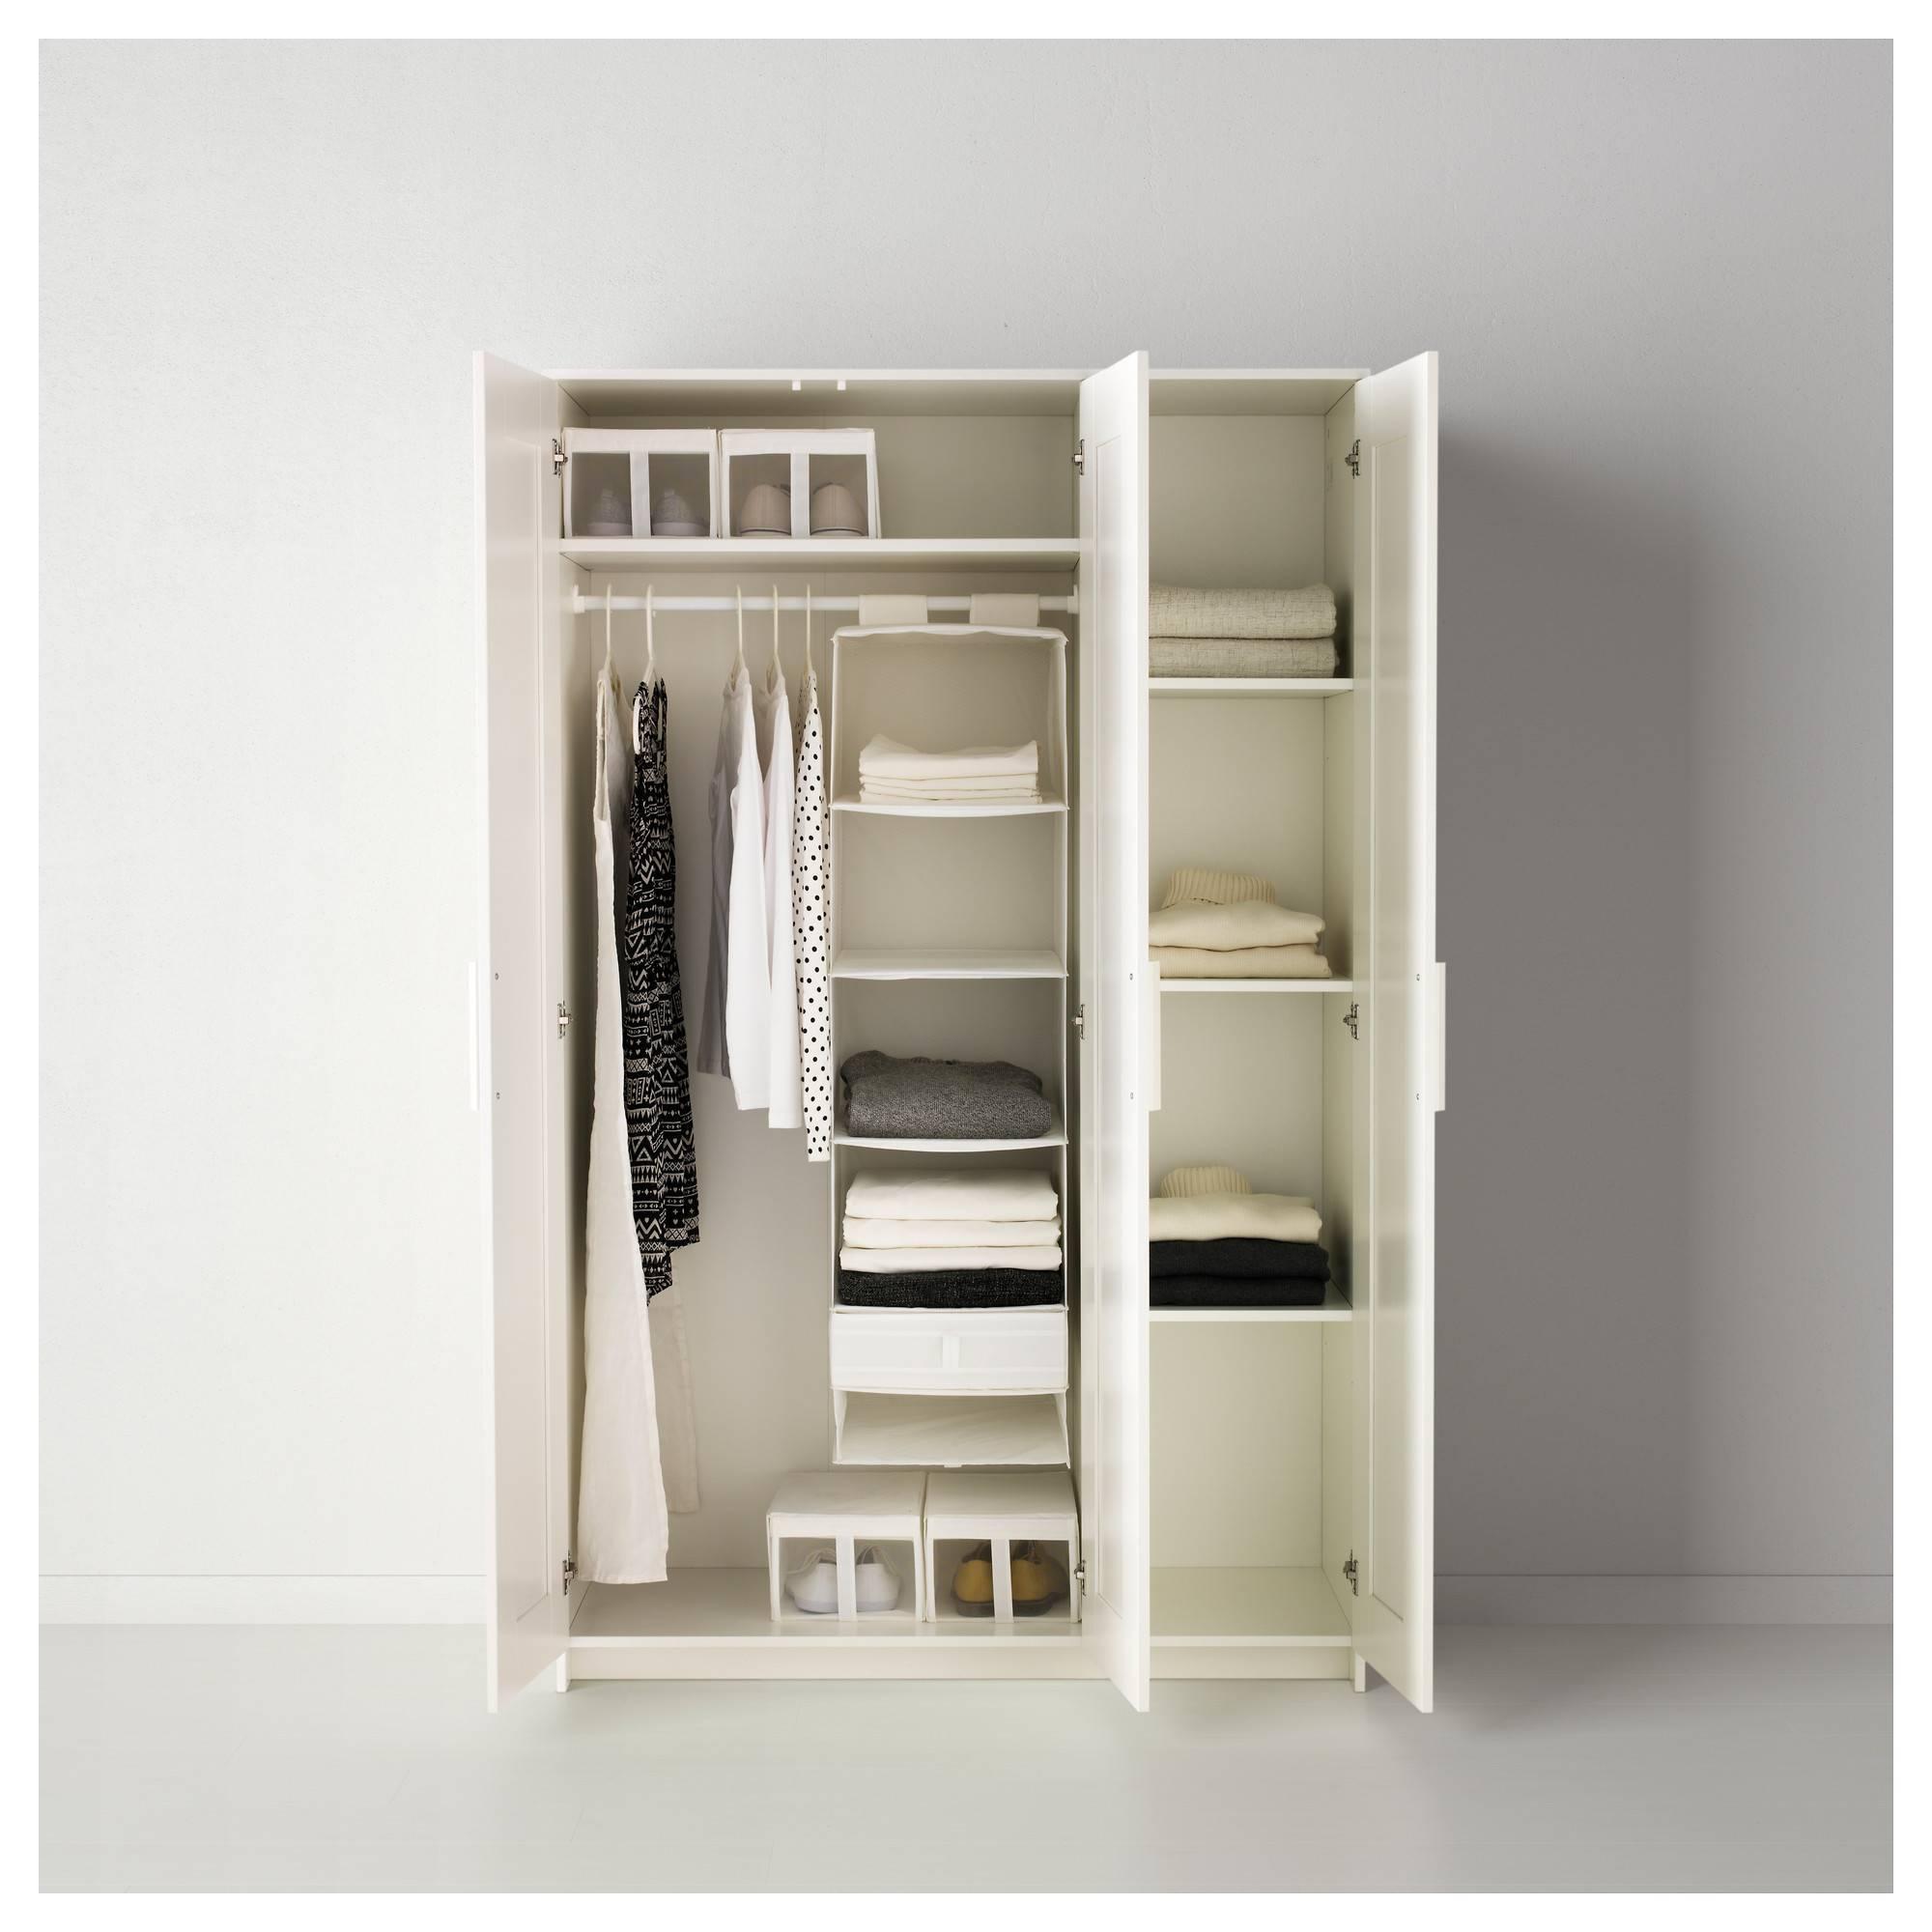 Brimnes Wardrobe With 3 Doors - White - Ikea within Wardrobes 3 Door With Mirror (Image 5 of 15)